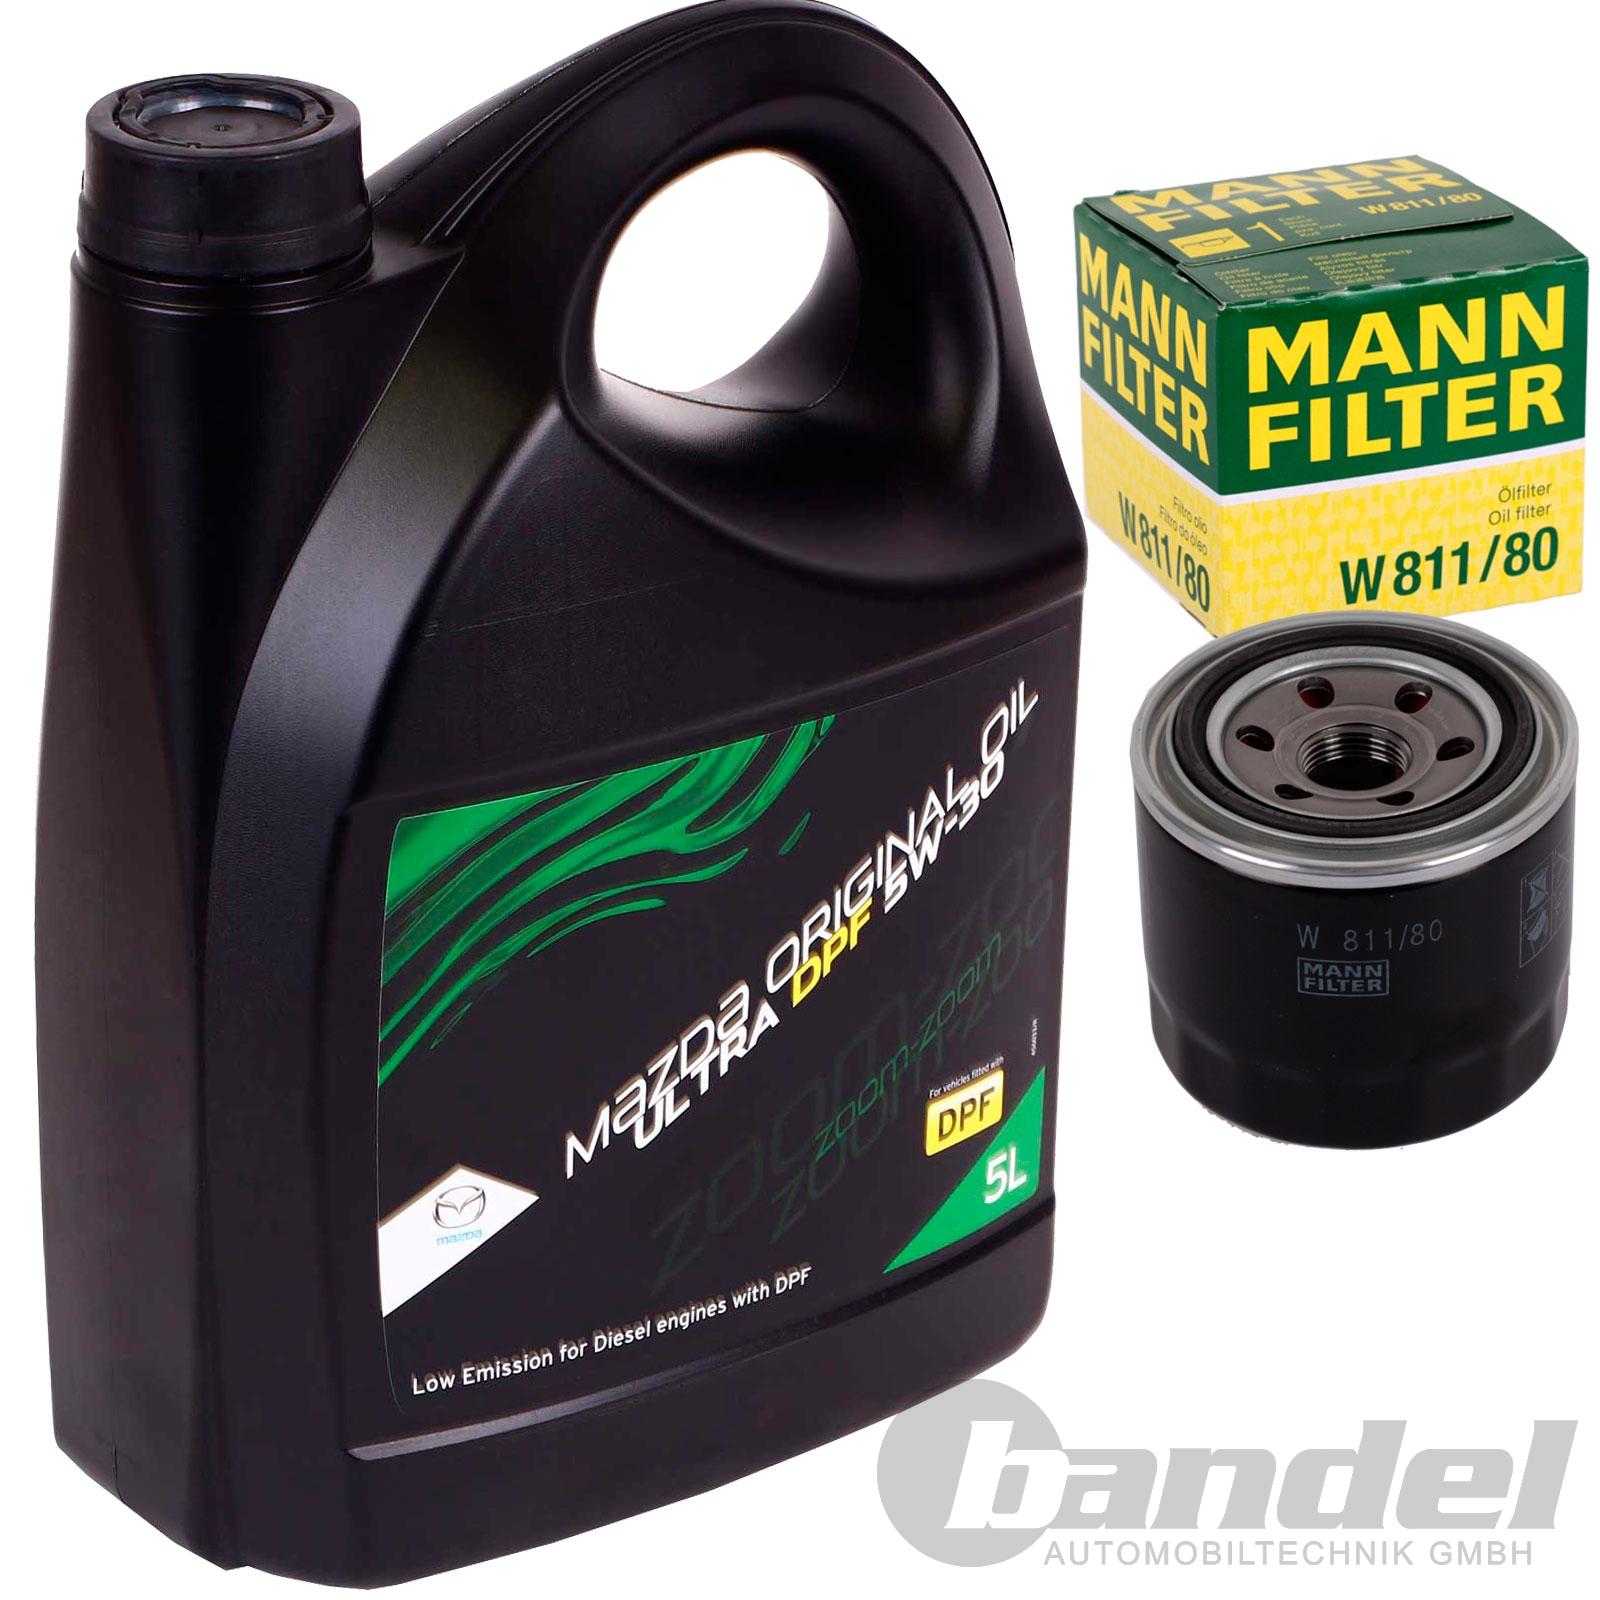 original mazda motorÖl Öl+Ölfilter mazda 3 323 5 6 626 premacy